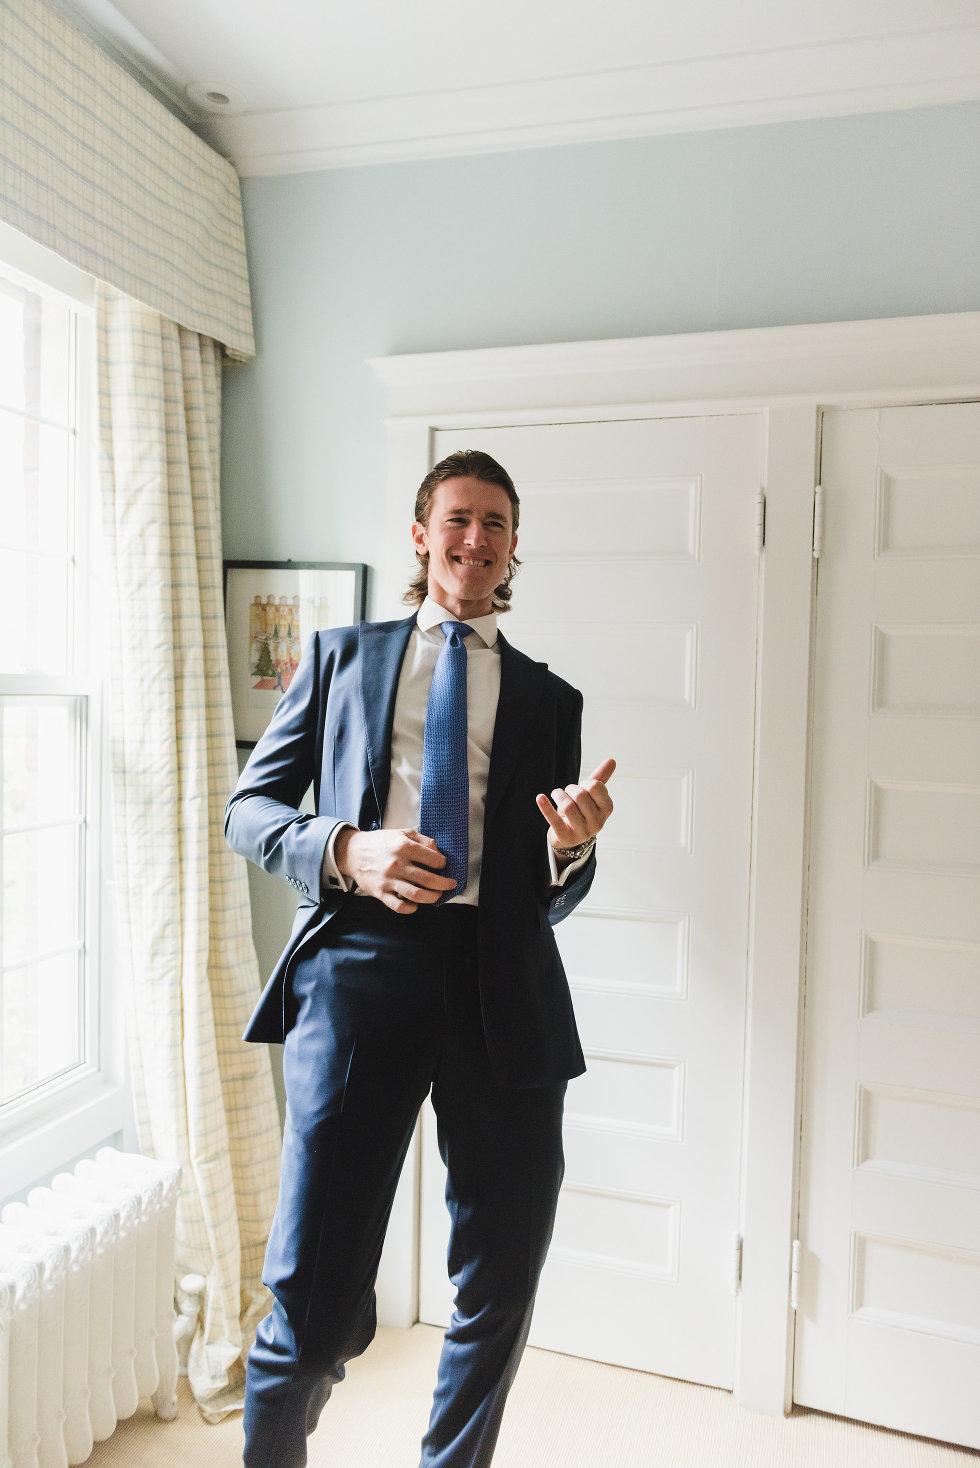 groom standing next to window doing an air guitar Toronto wedding photographer